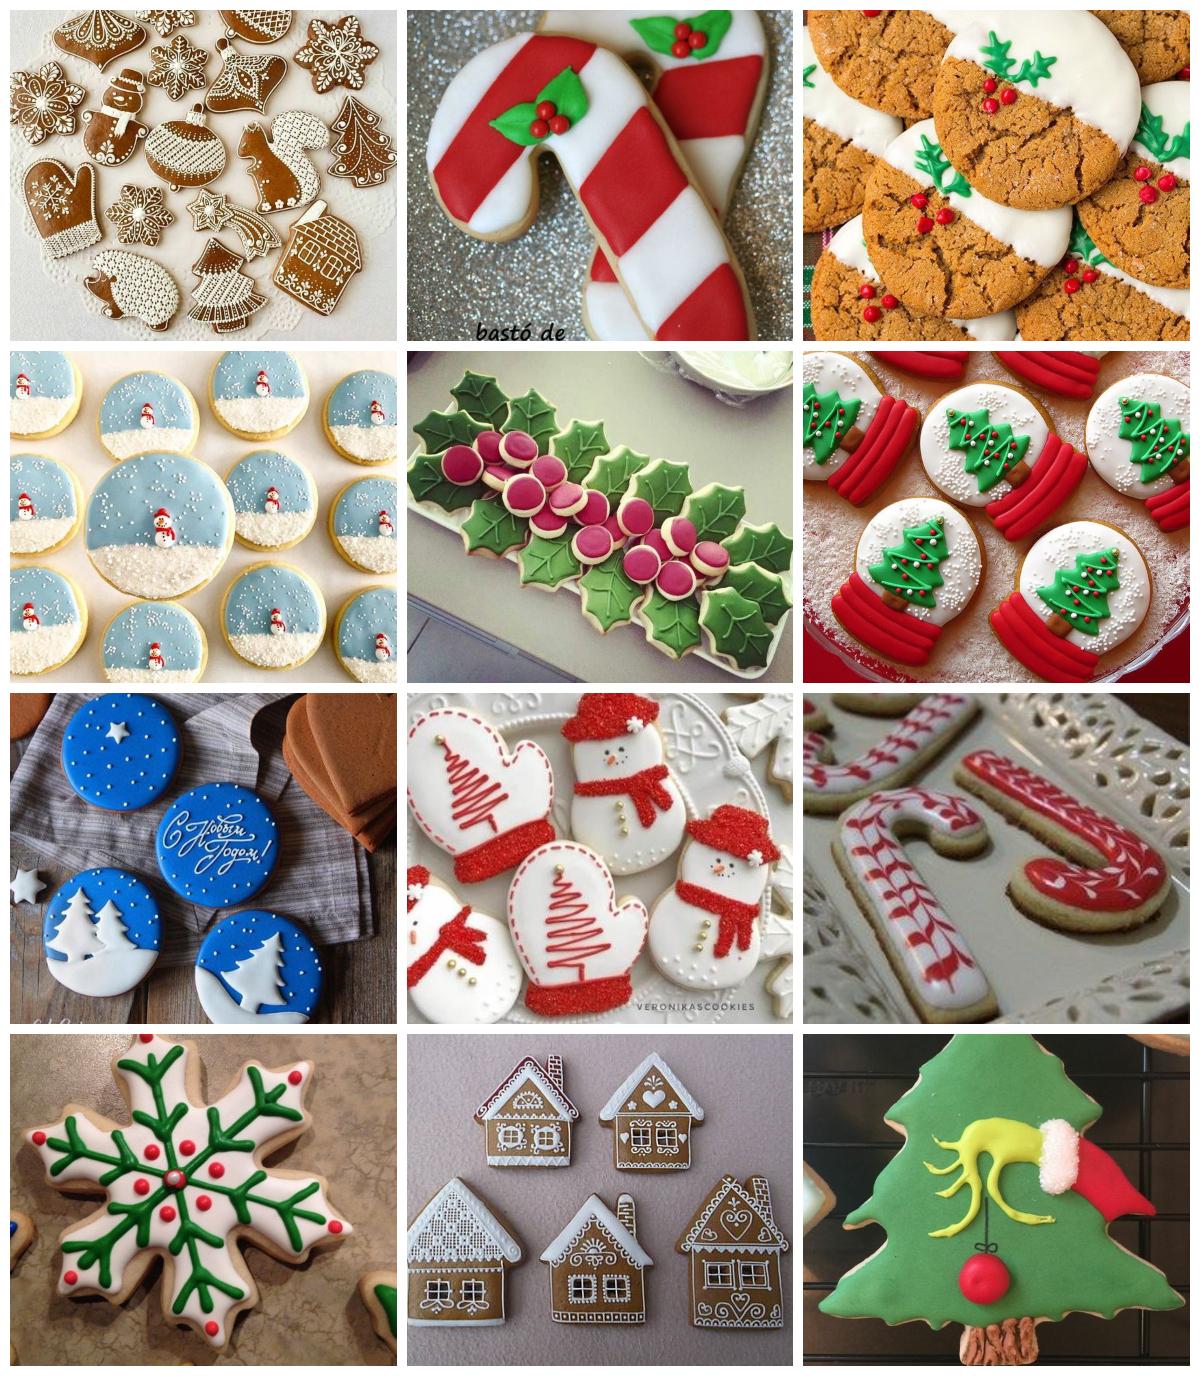 mezeskalacs_muffin_cupcake_dekoralas_cukrasz_trukk_karacsony_sutemeny.jpg